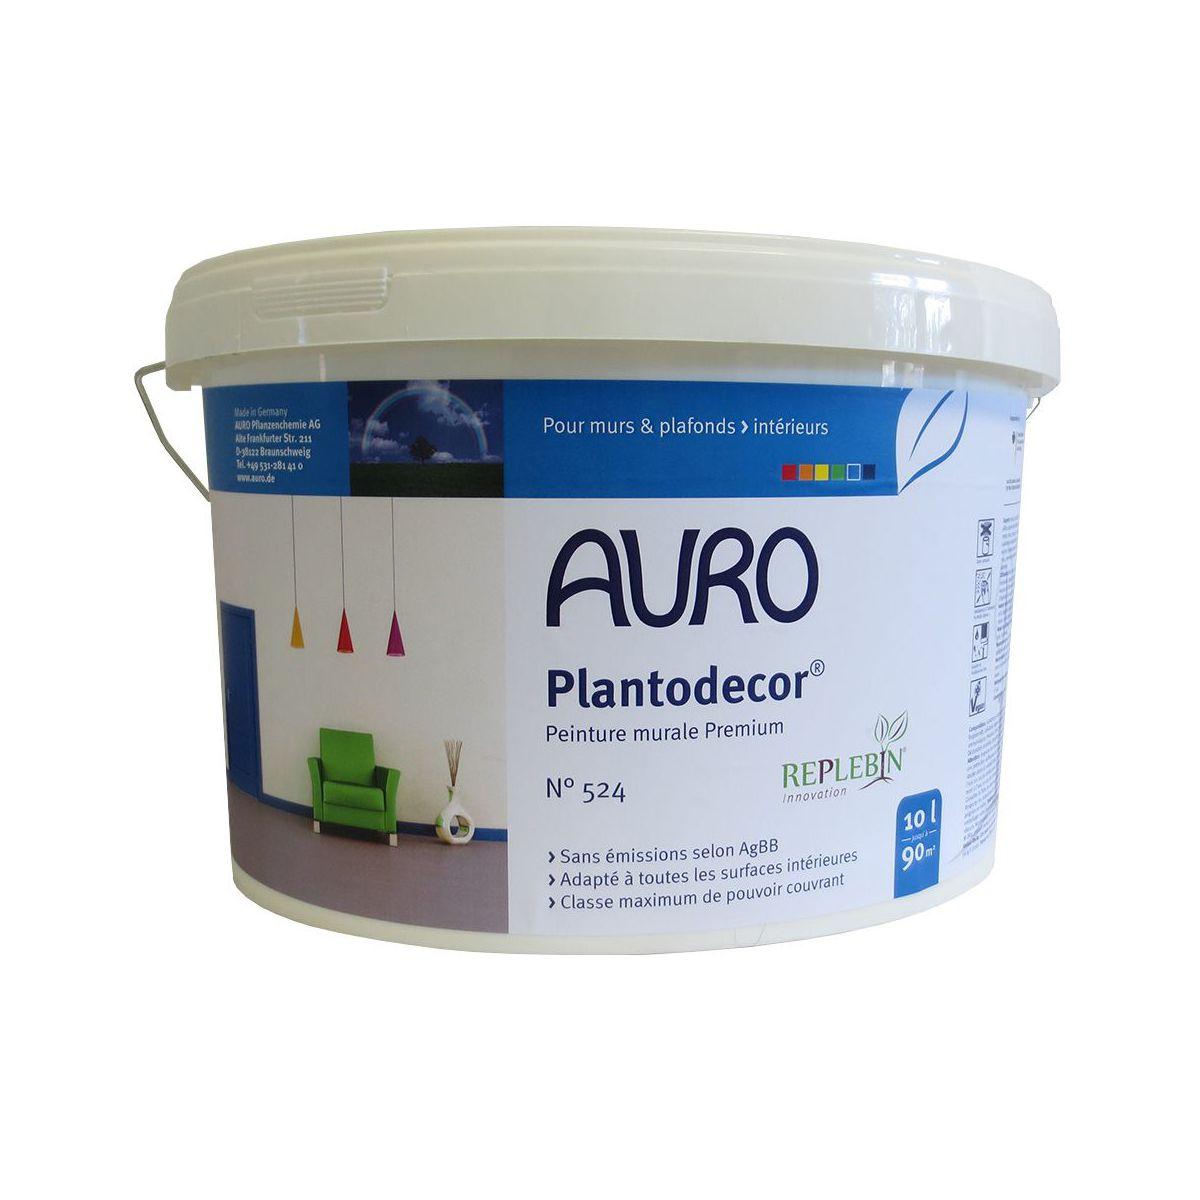 Peinture auro plantodecor premium 524 for Nouvelle peinture murale